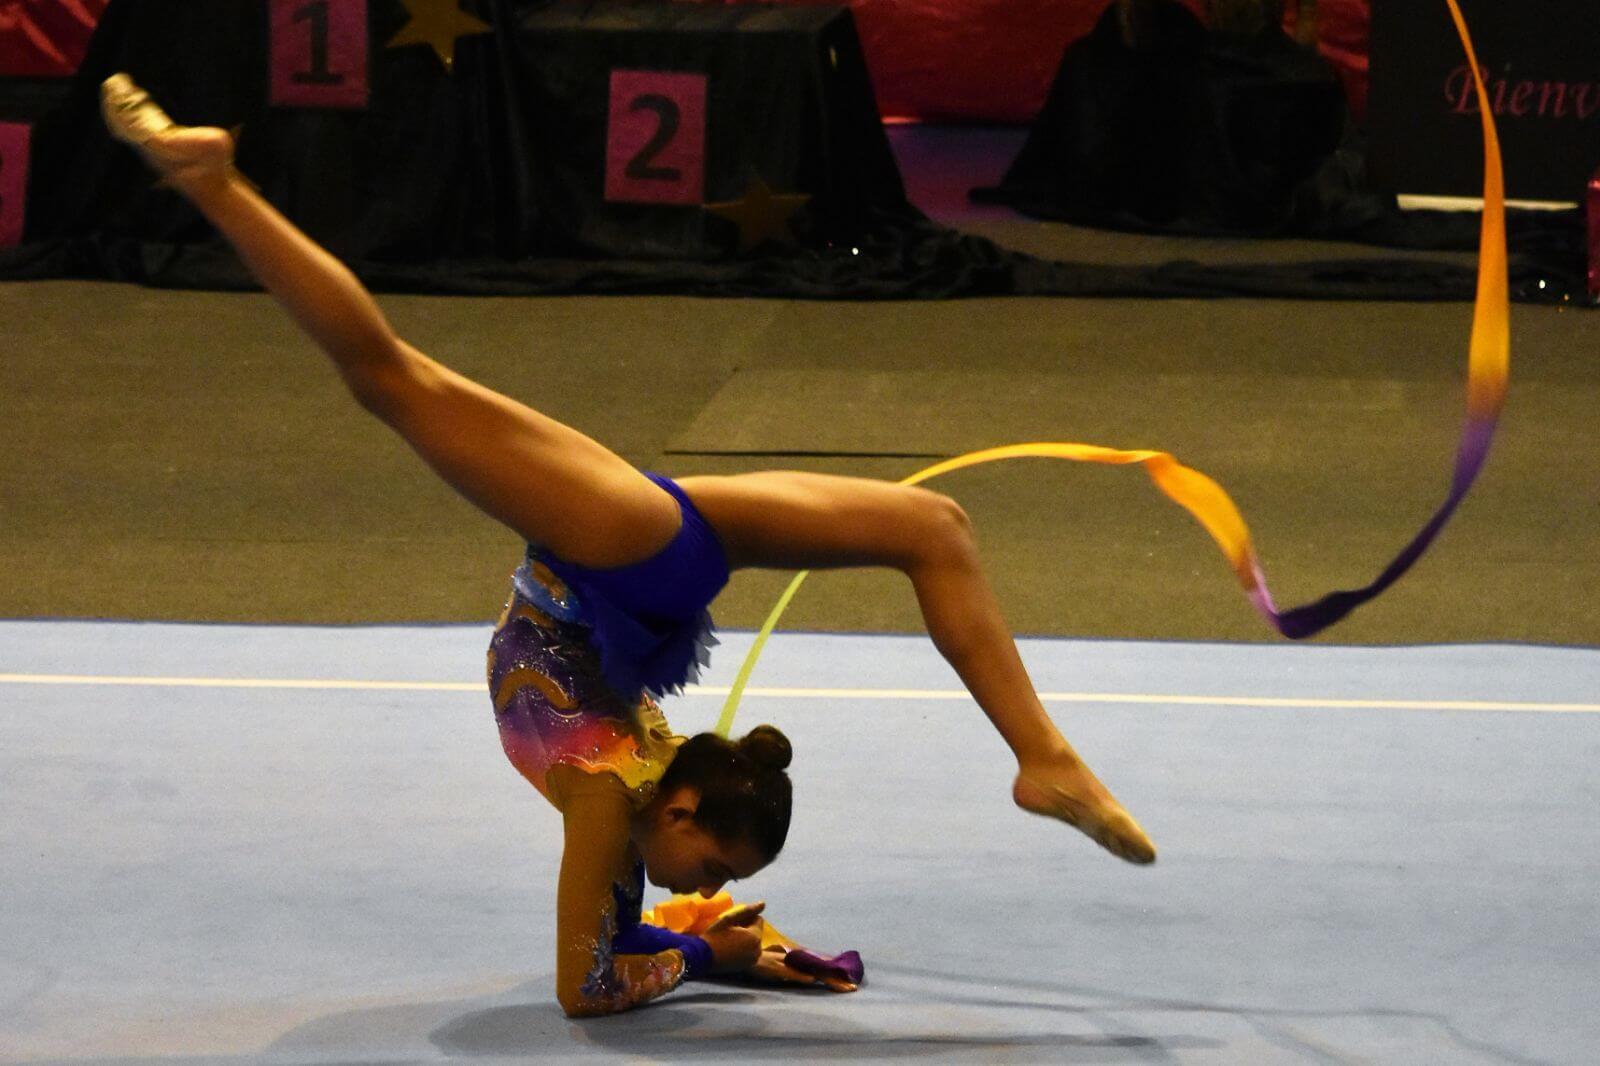 Marta, Monaco Gymnastics Club